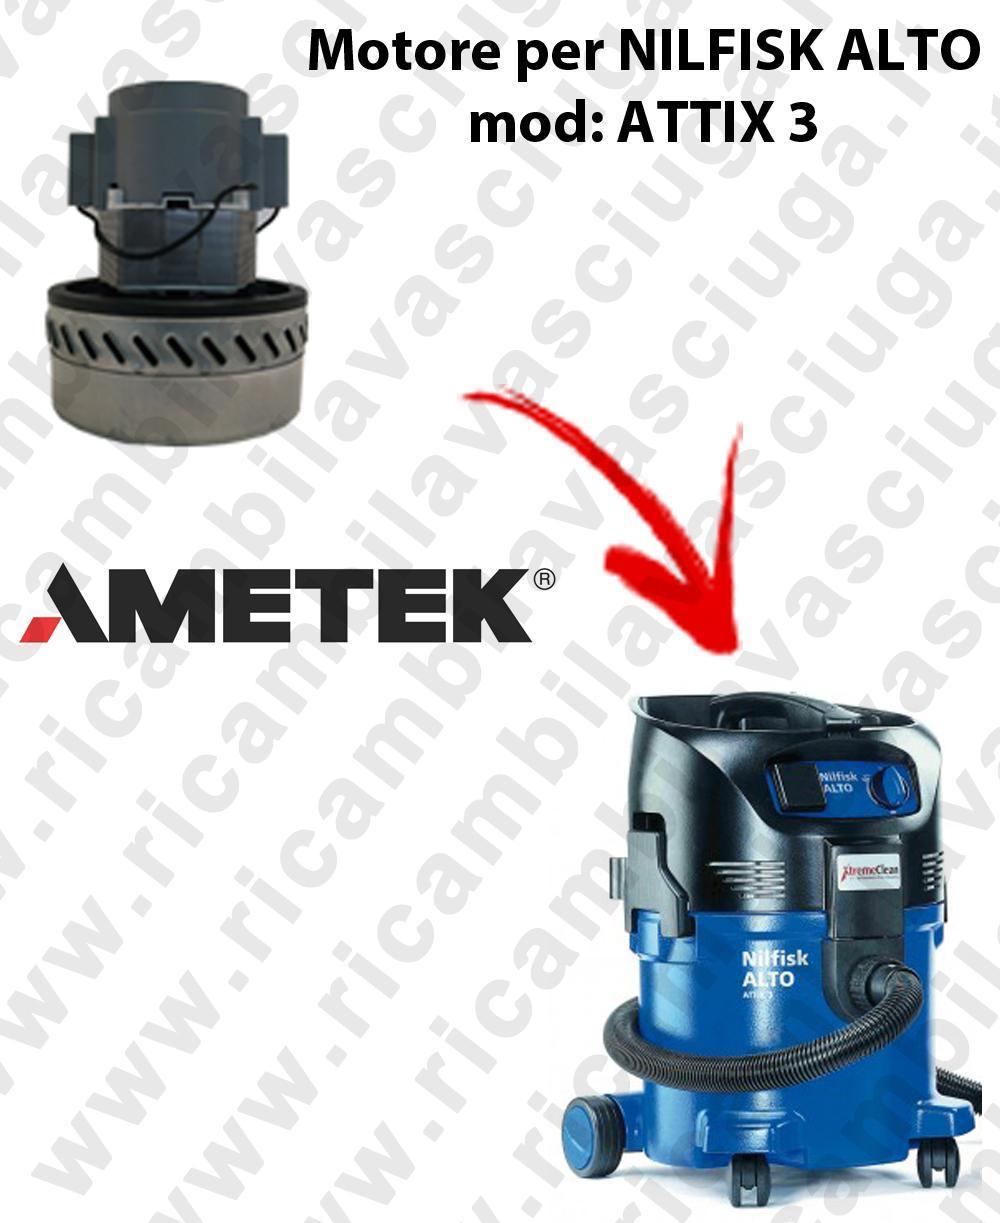 ATTIX 3 ( fino al 2007) MOTEUR ASPIRATION AMETEK  pour aspirateur NILFISK ALTO